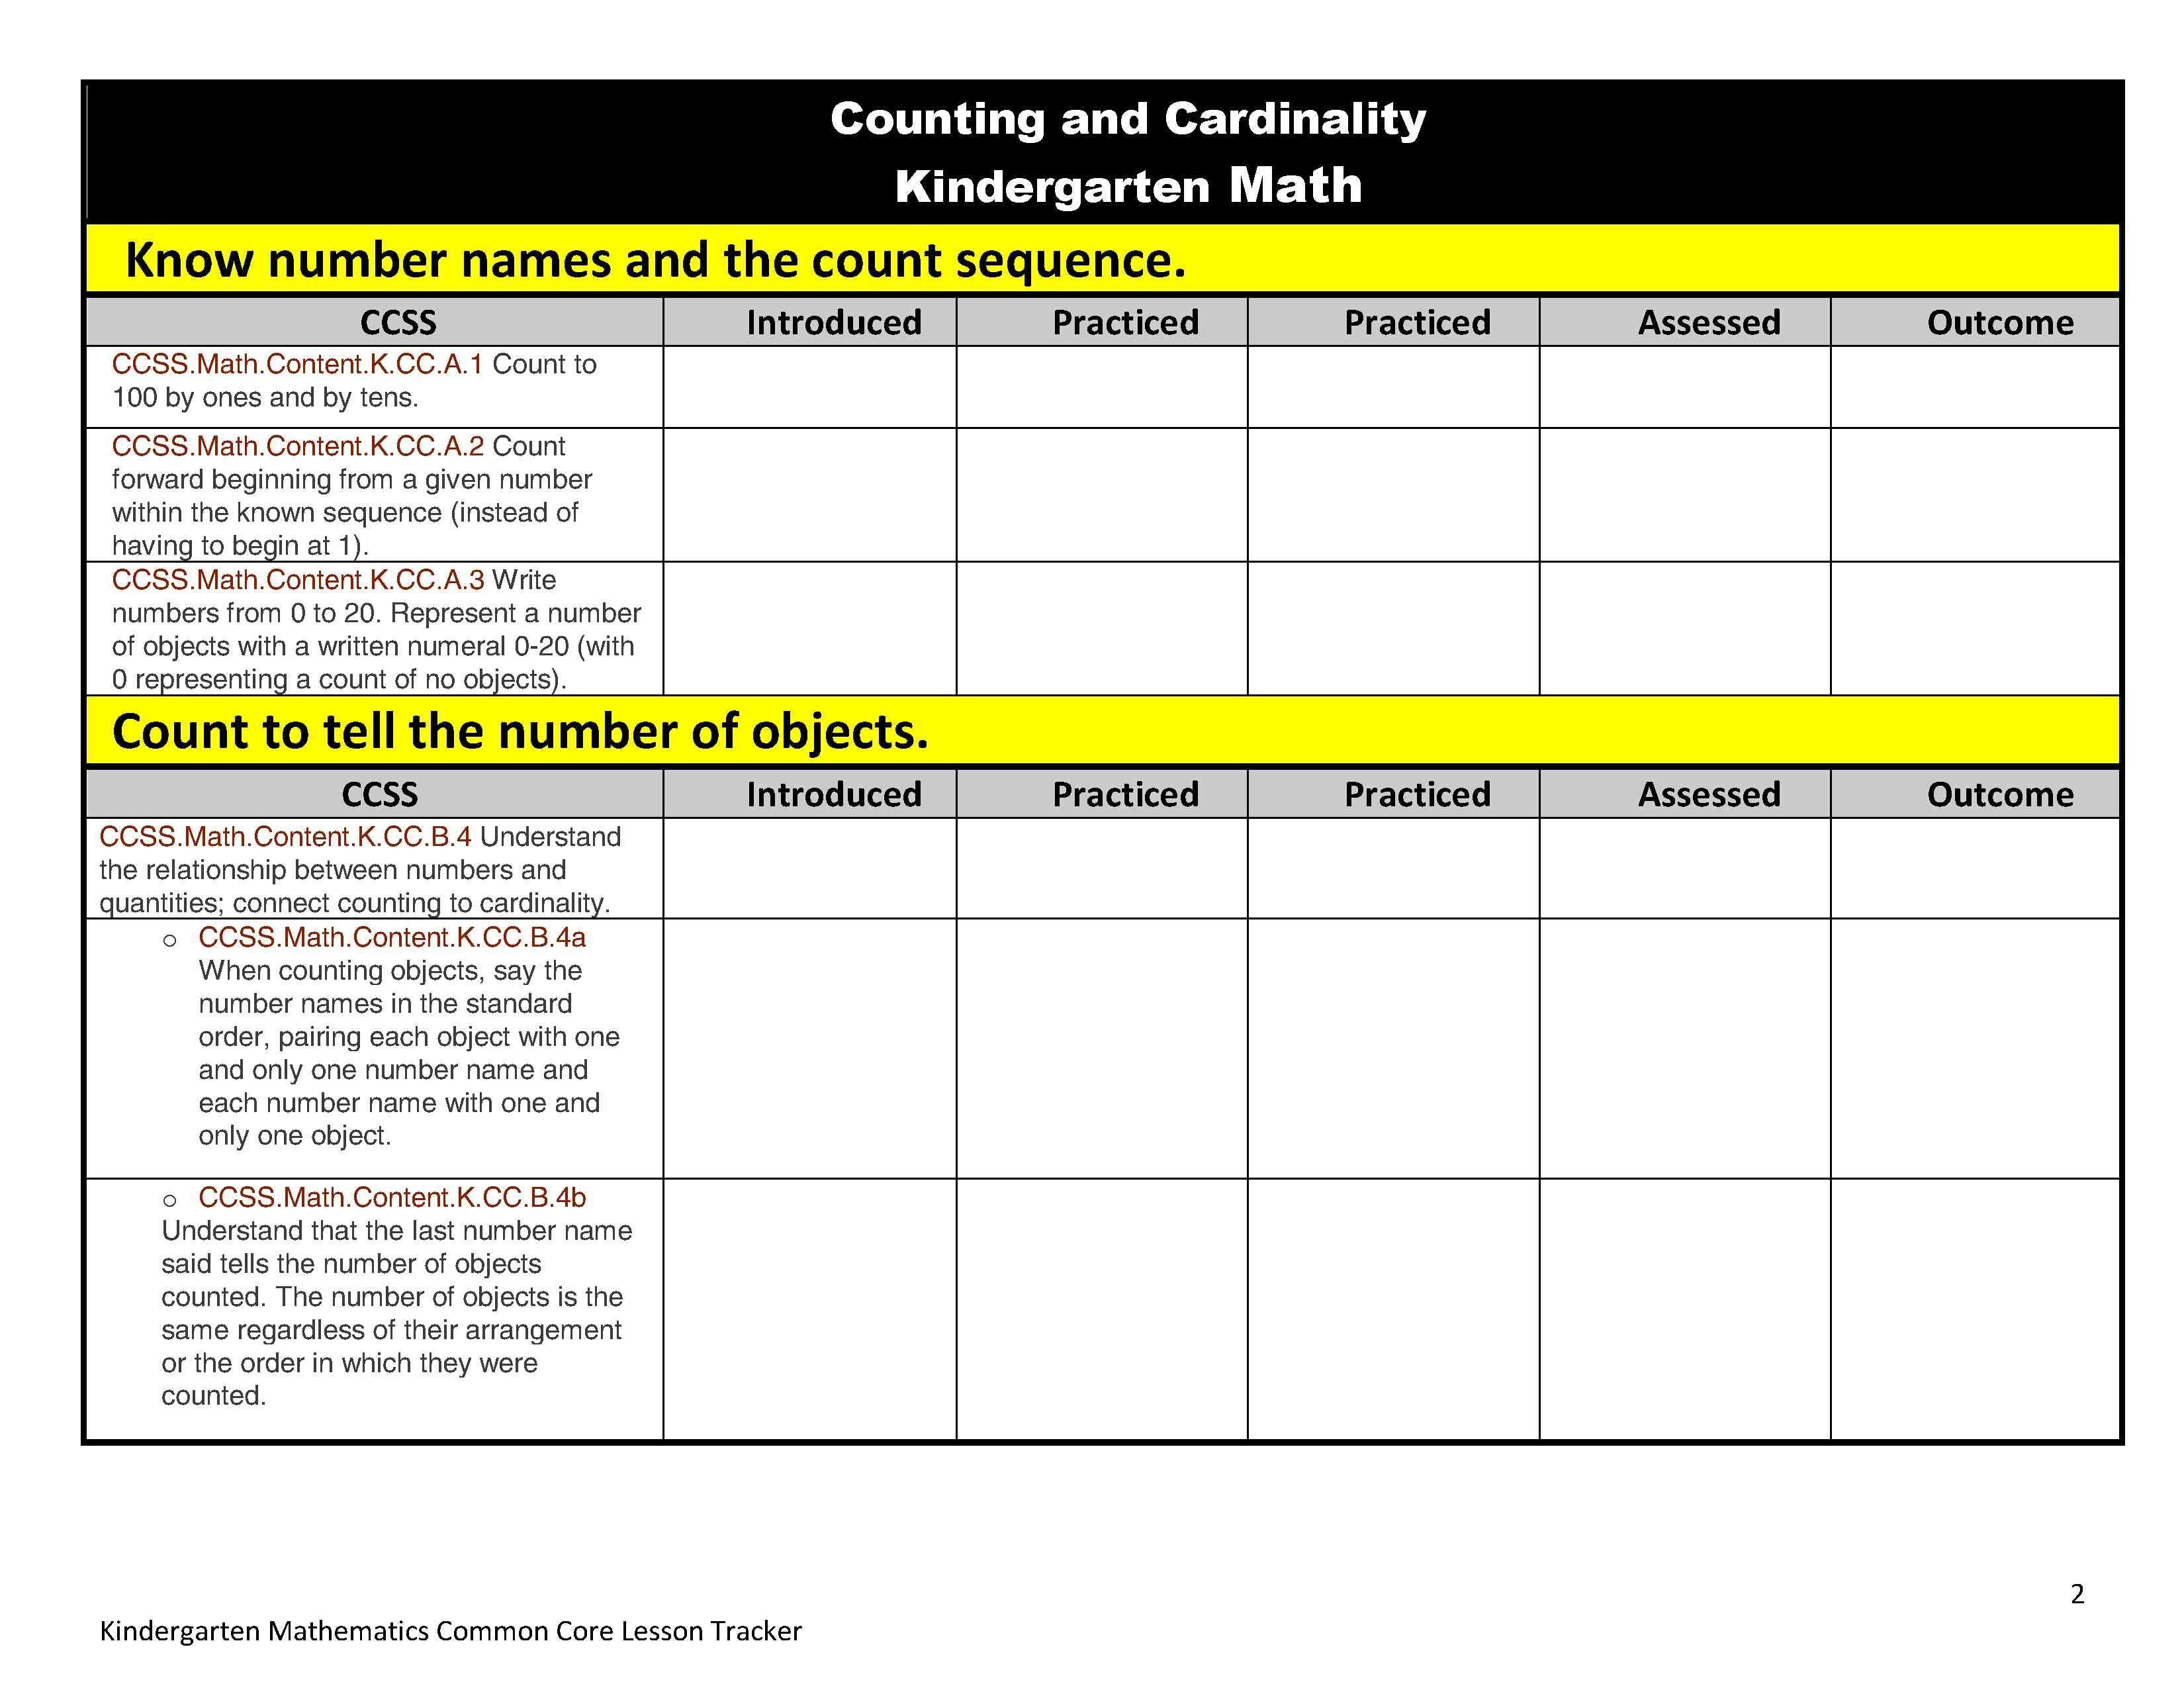 Common core lesson plan organizers for math and ela scholastic common core lesson plan organizers for math and ela scholastic falaconquin